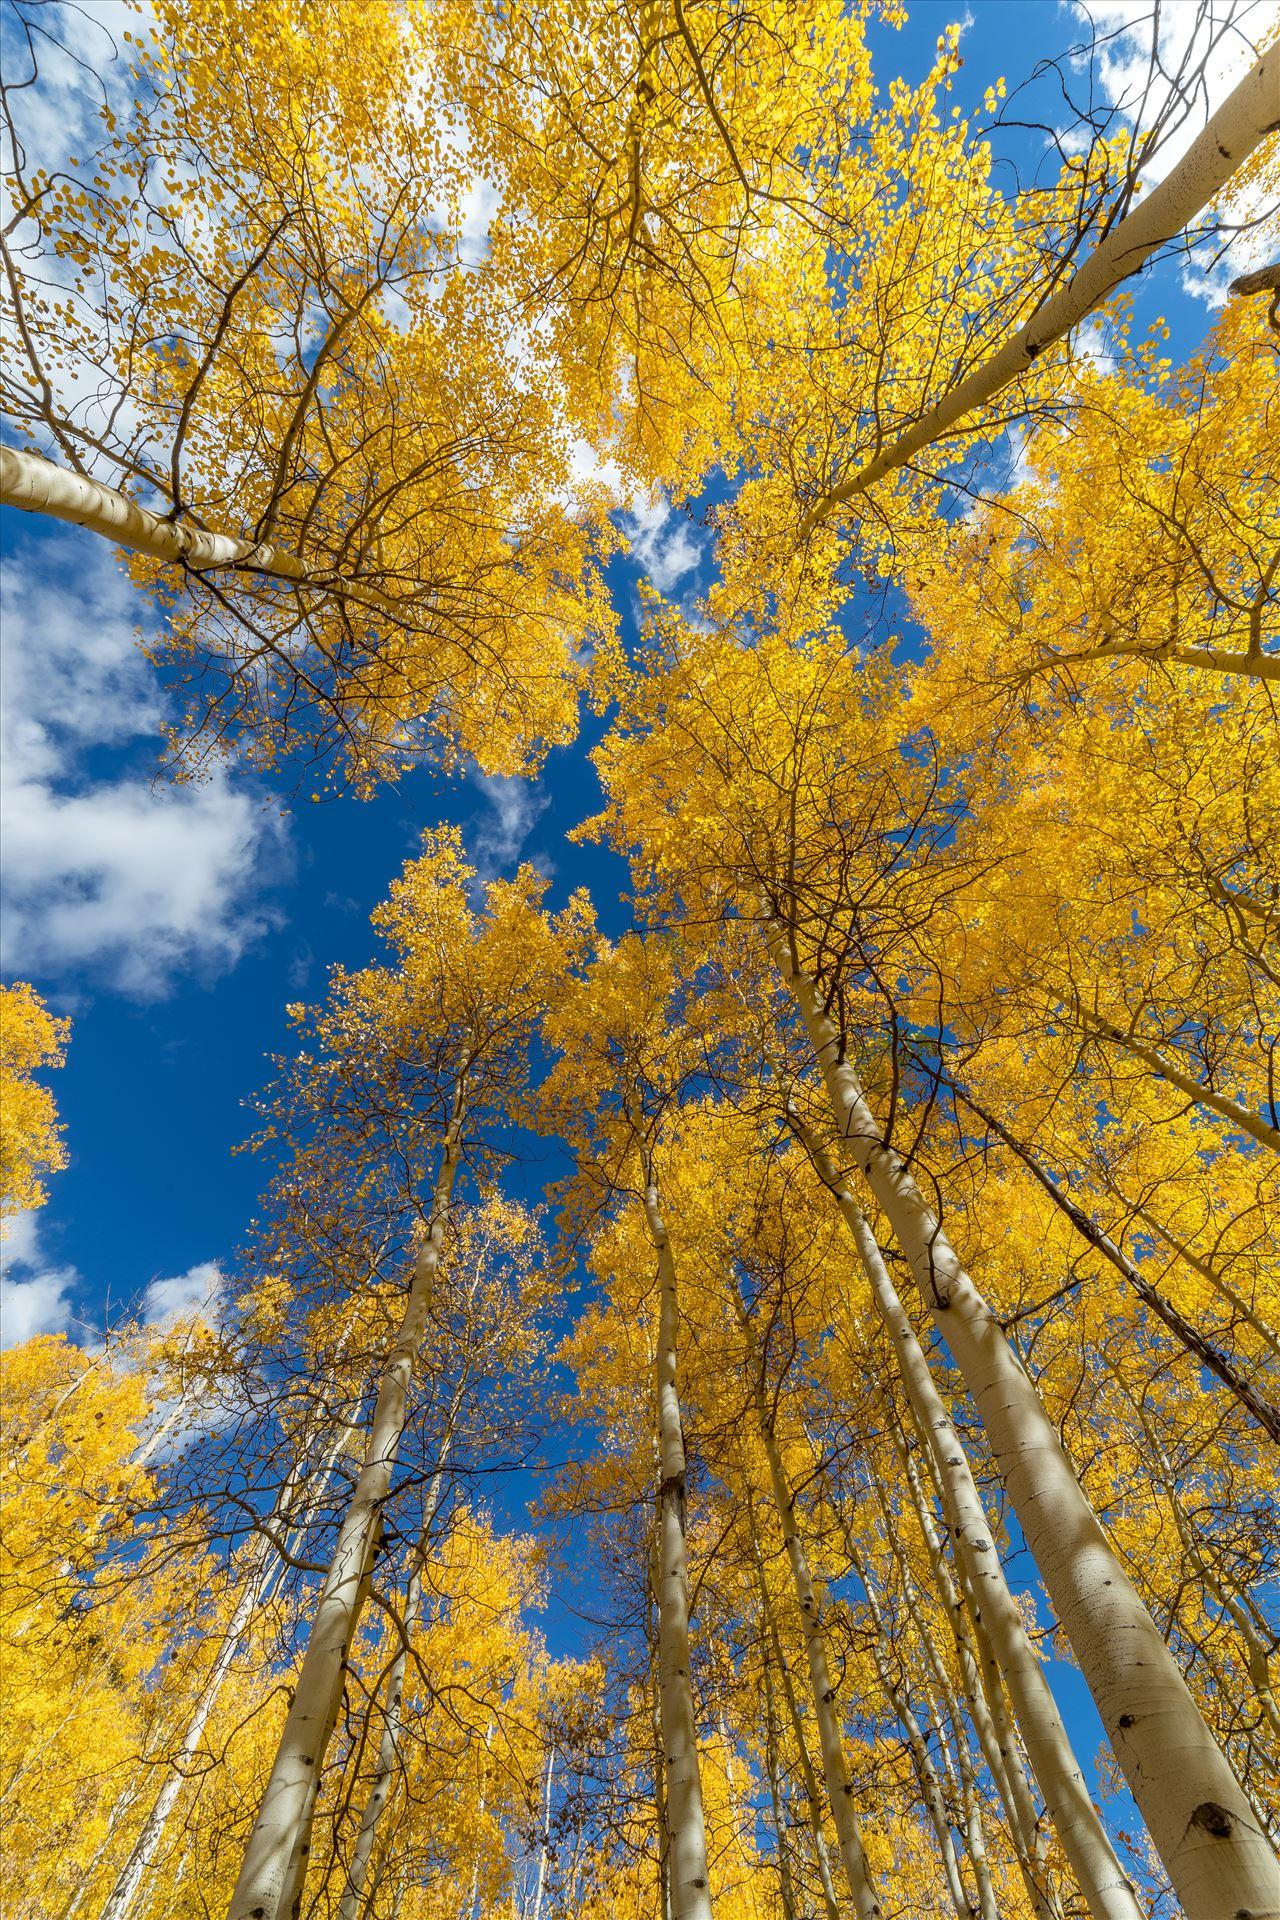 Aspens to the Sky No 1 Aspens reaching skyward in Fall. Taken near Maroon Creek Drive near Aspen, Colorado. by Scott Smith Photos